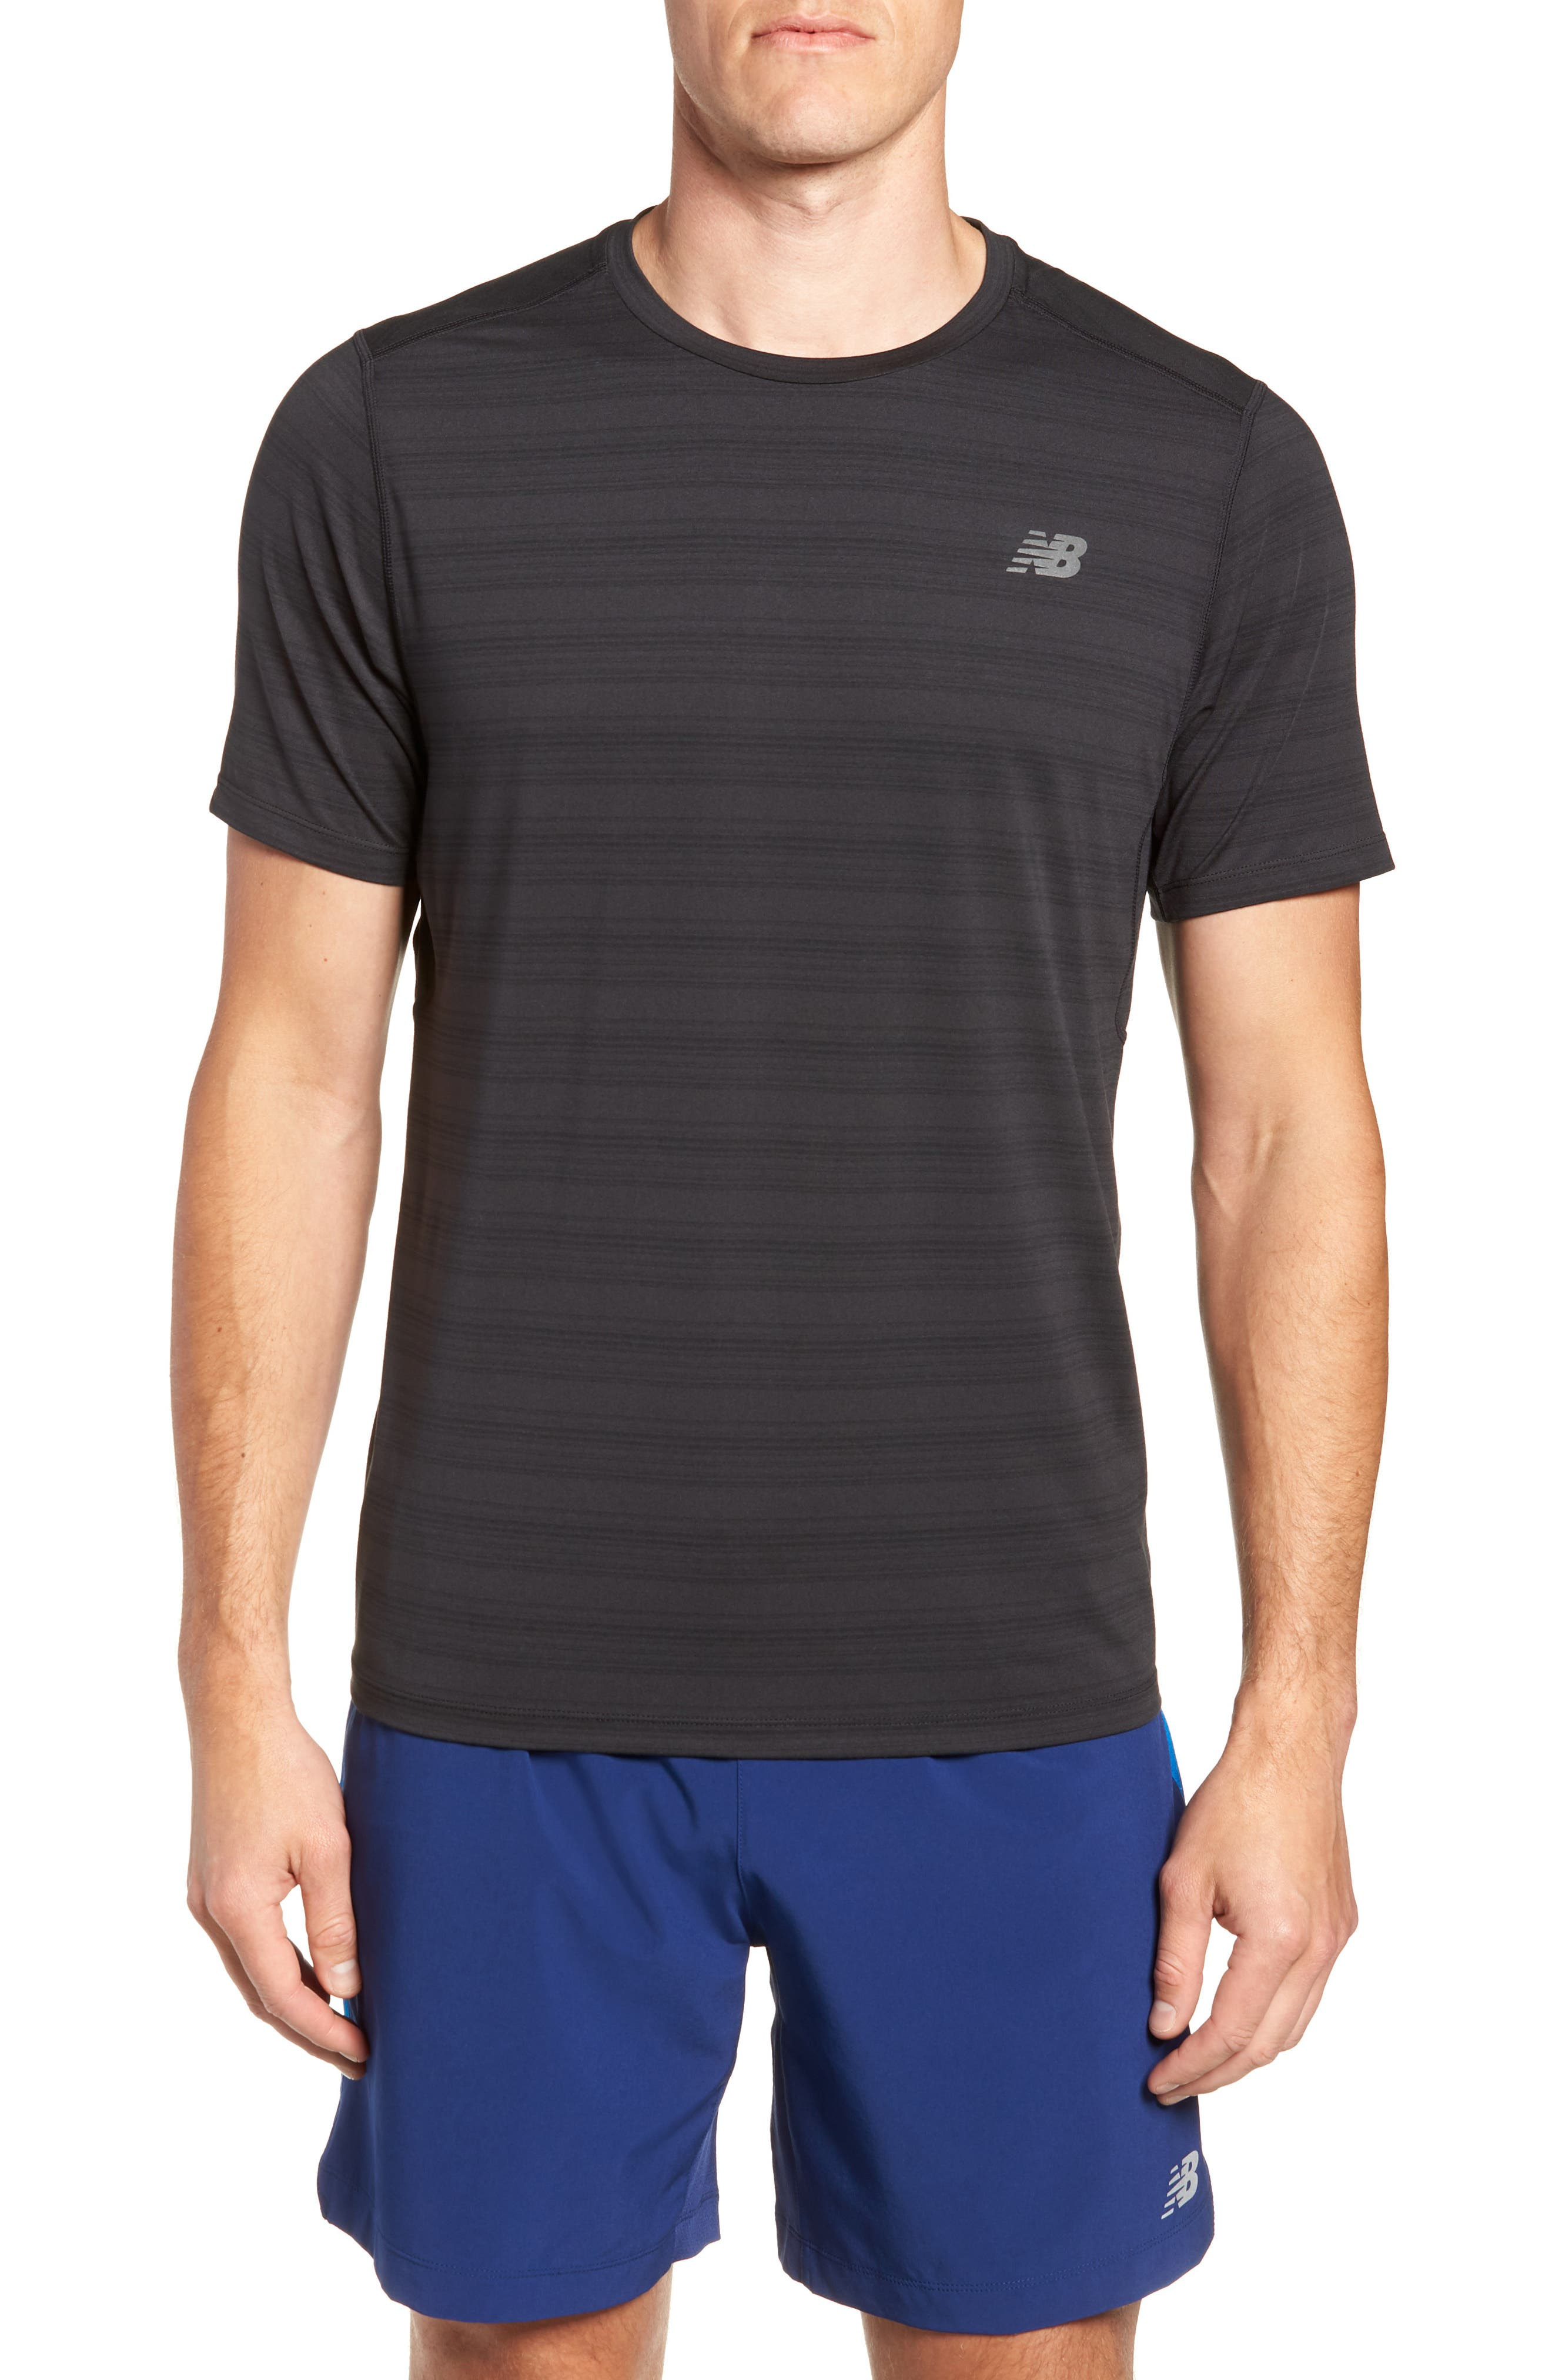 New Balance Anticipate Performance T-Shirt